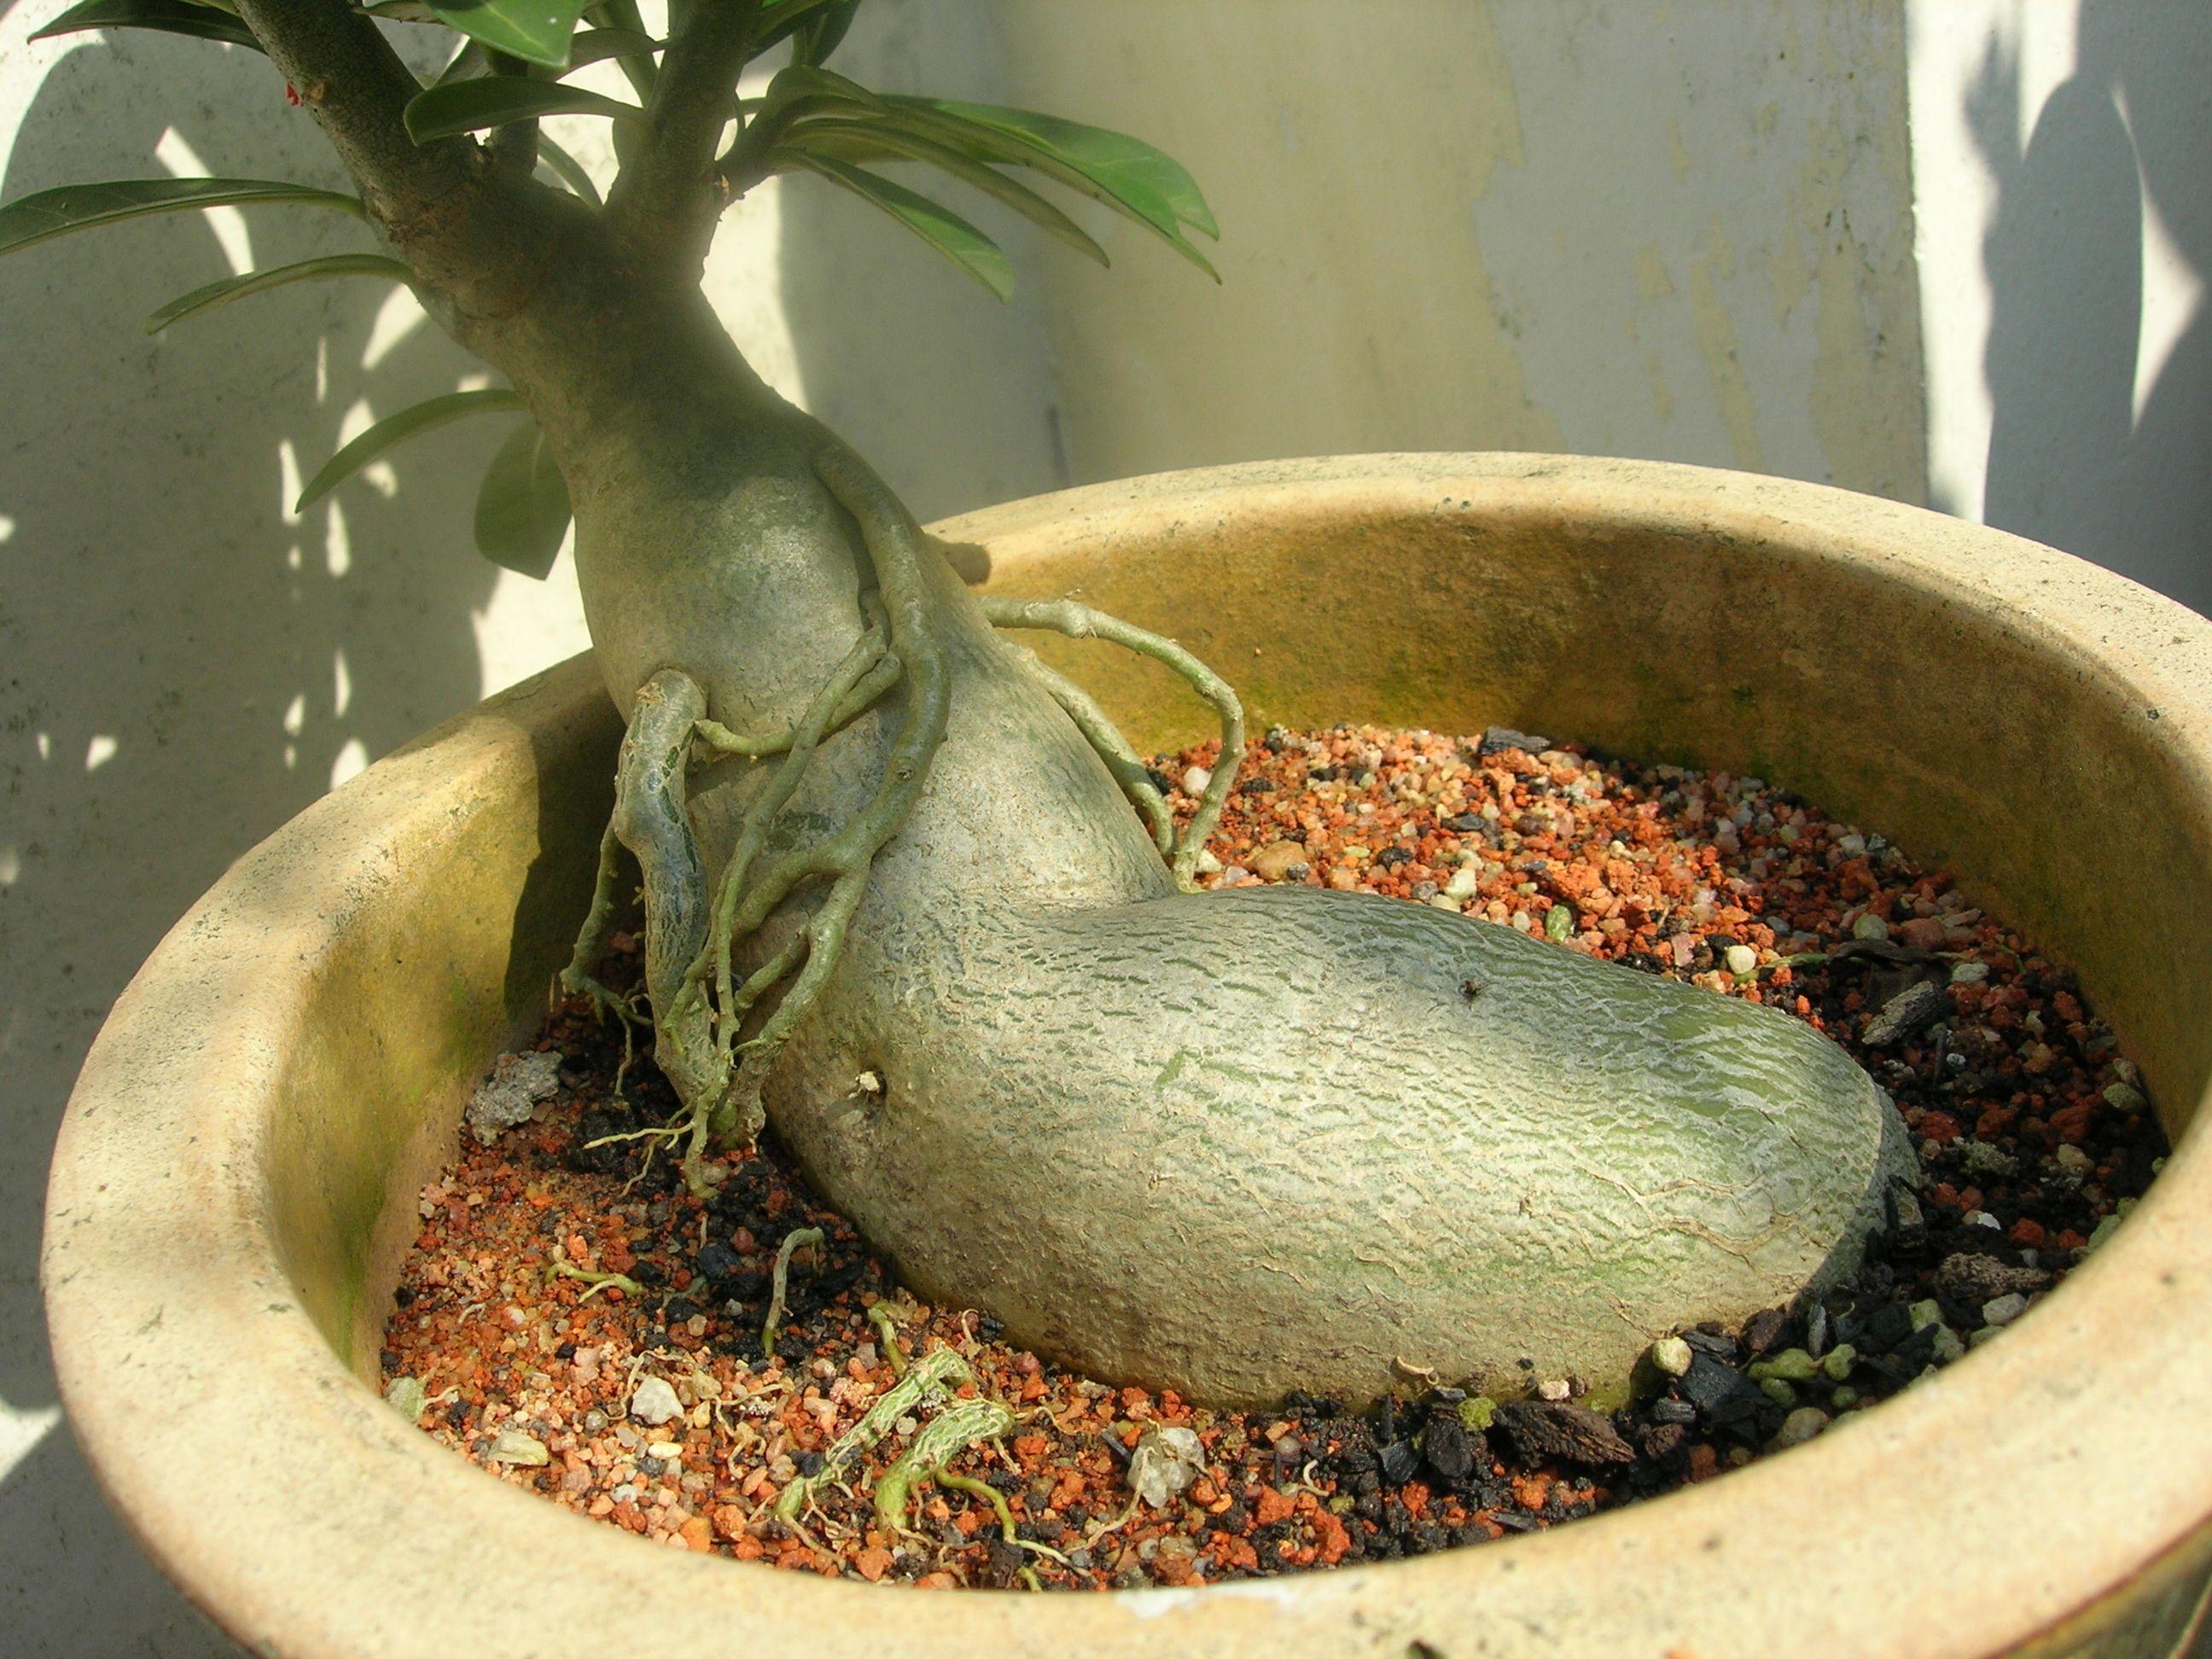 13+ Plants that look like animals ideas